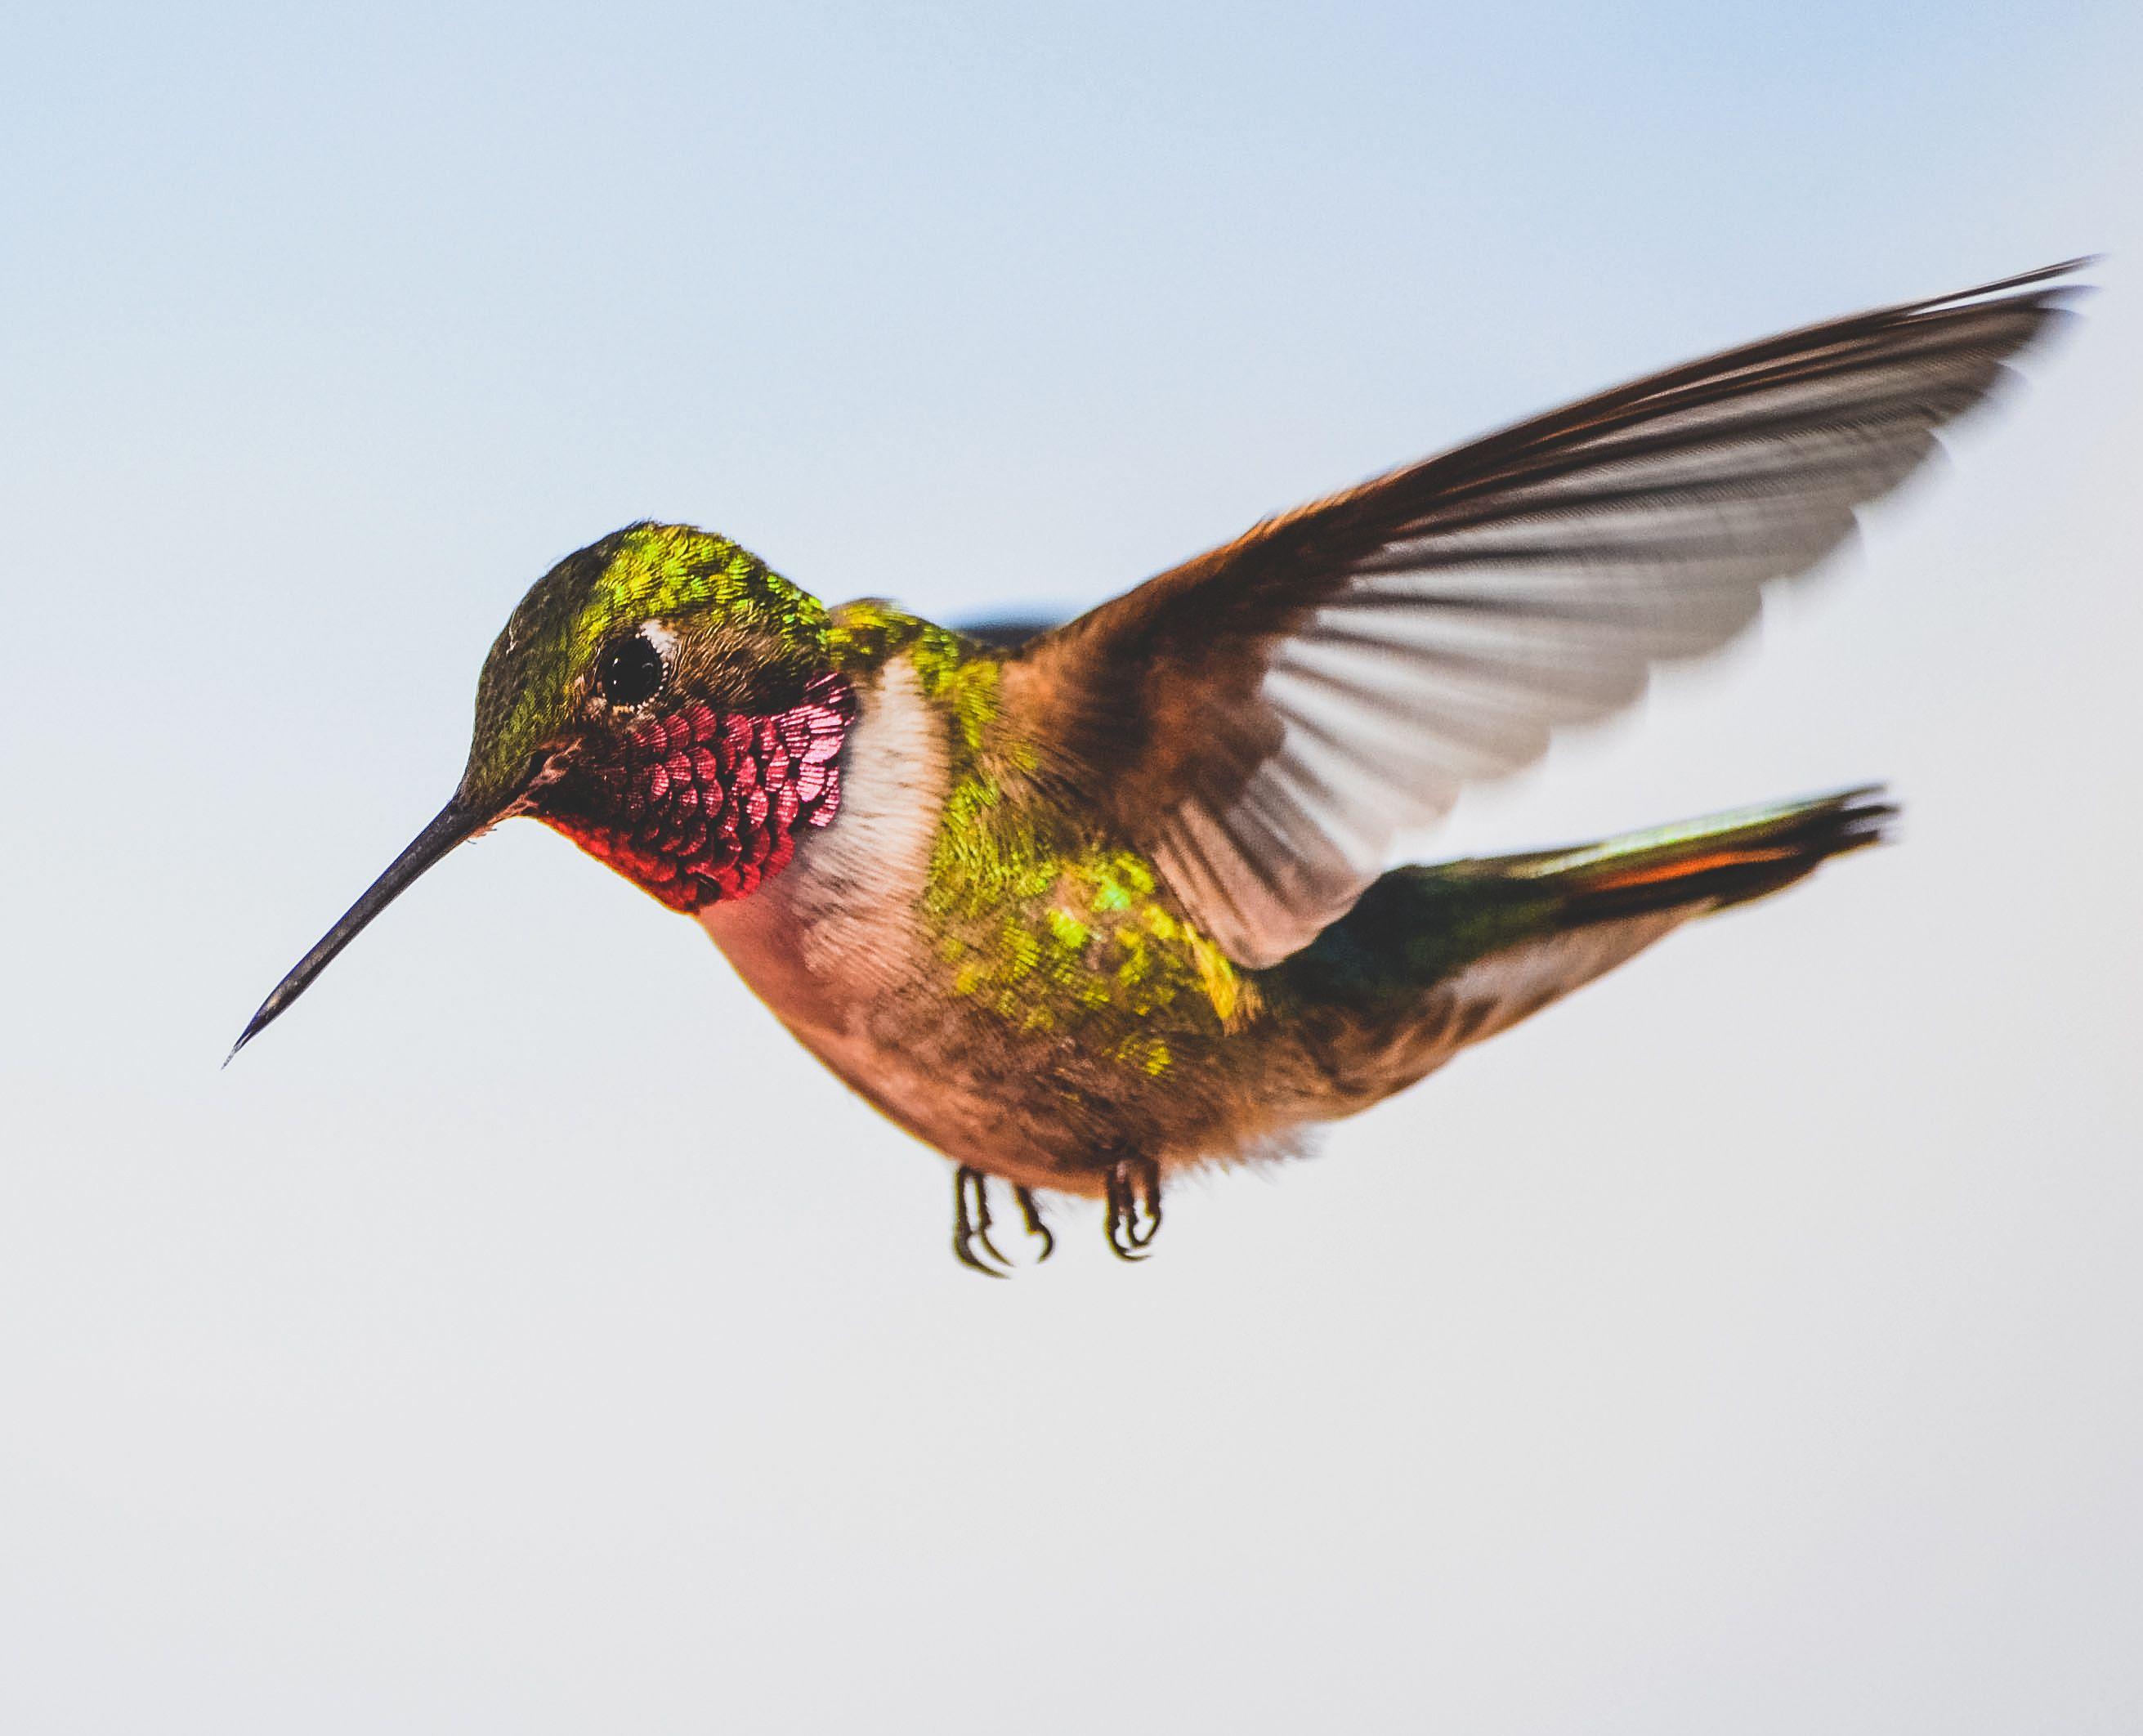 Canva - Photo Of A Hummingbird-1.jpg